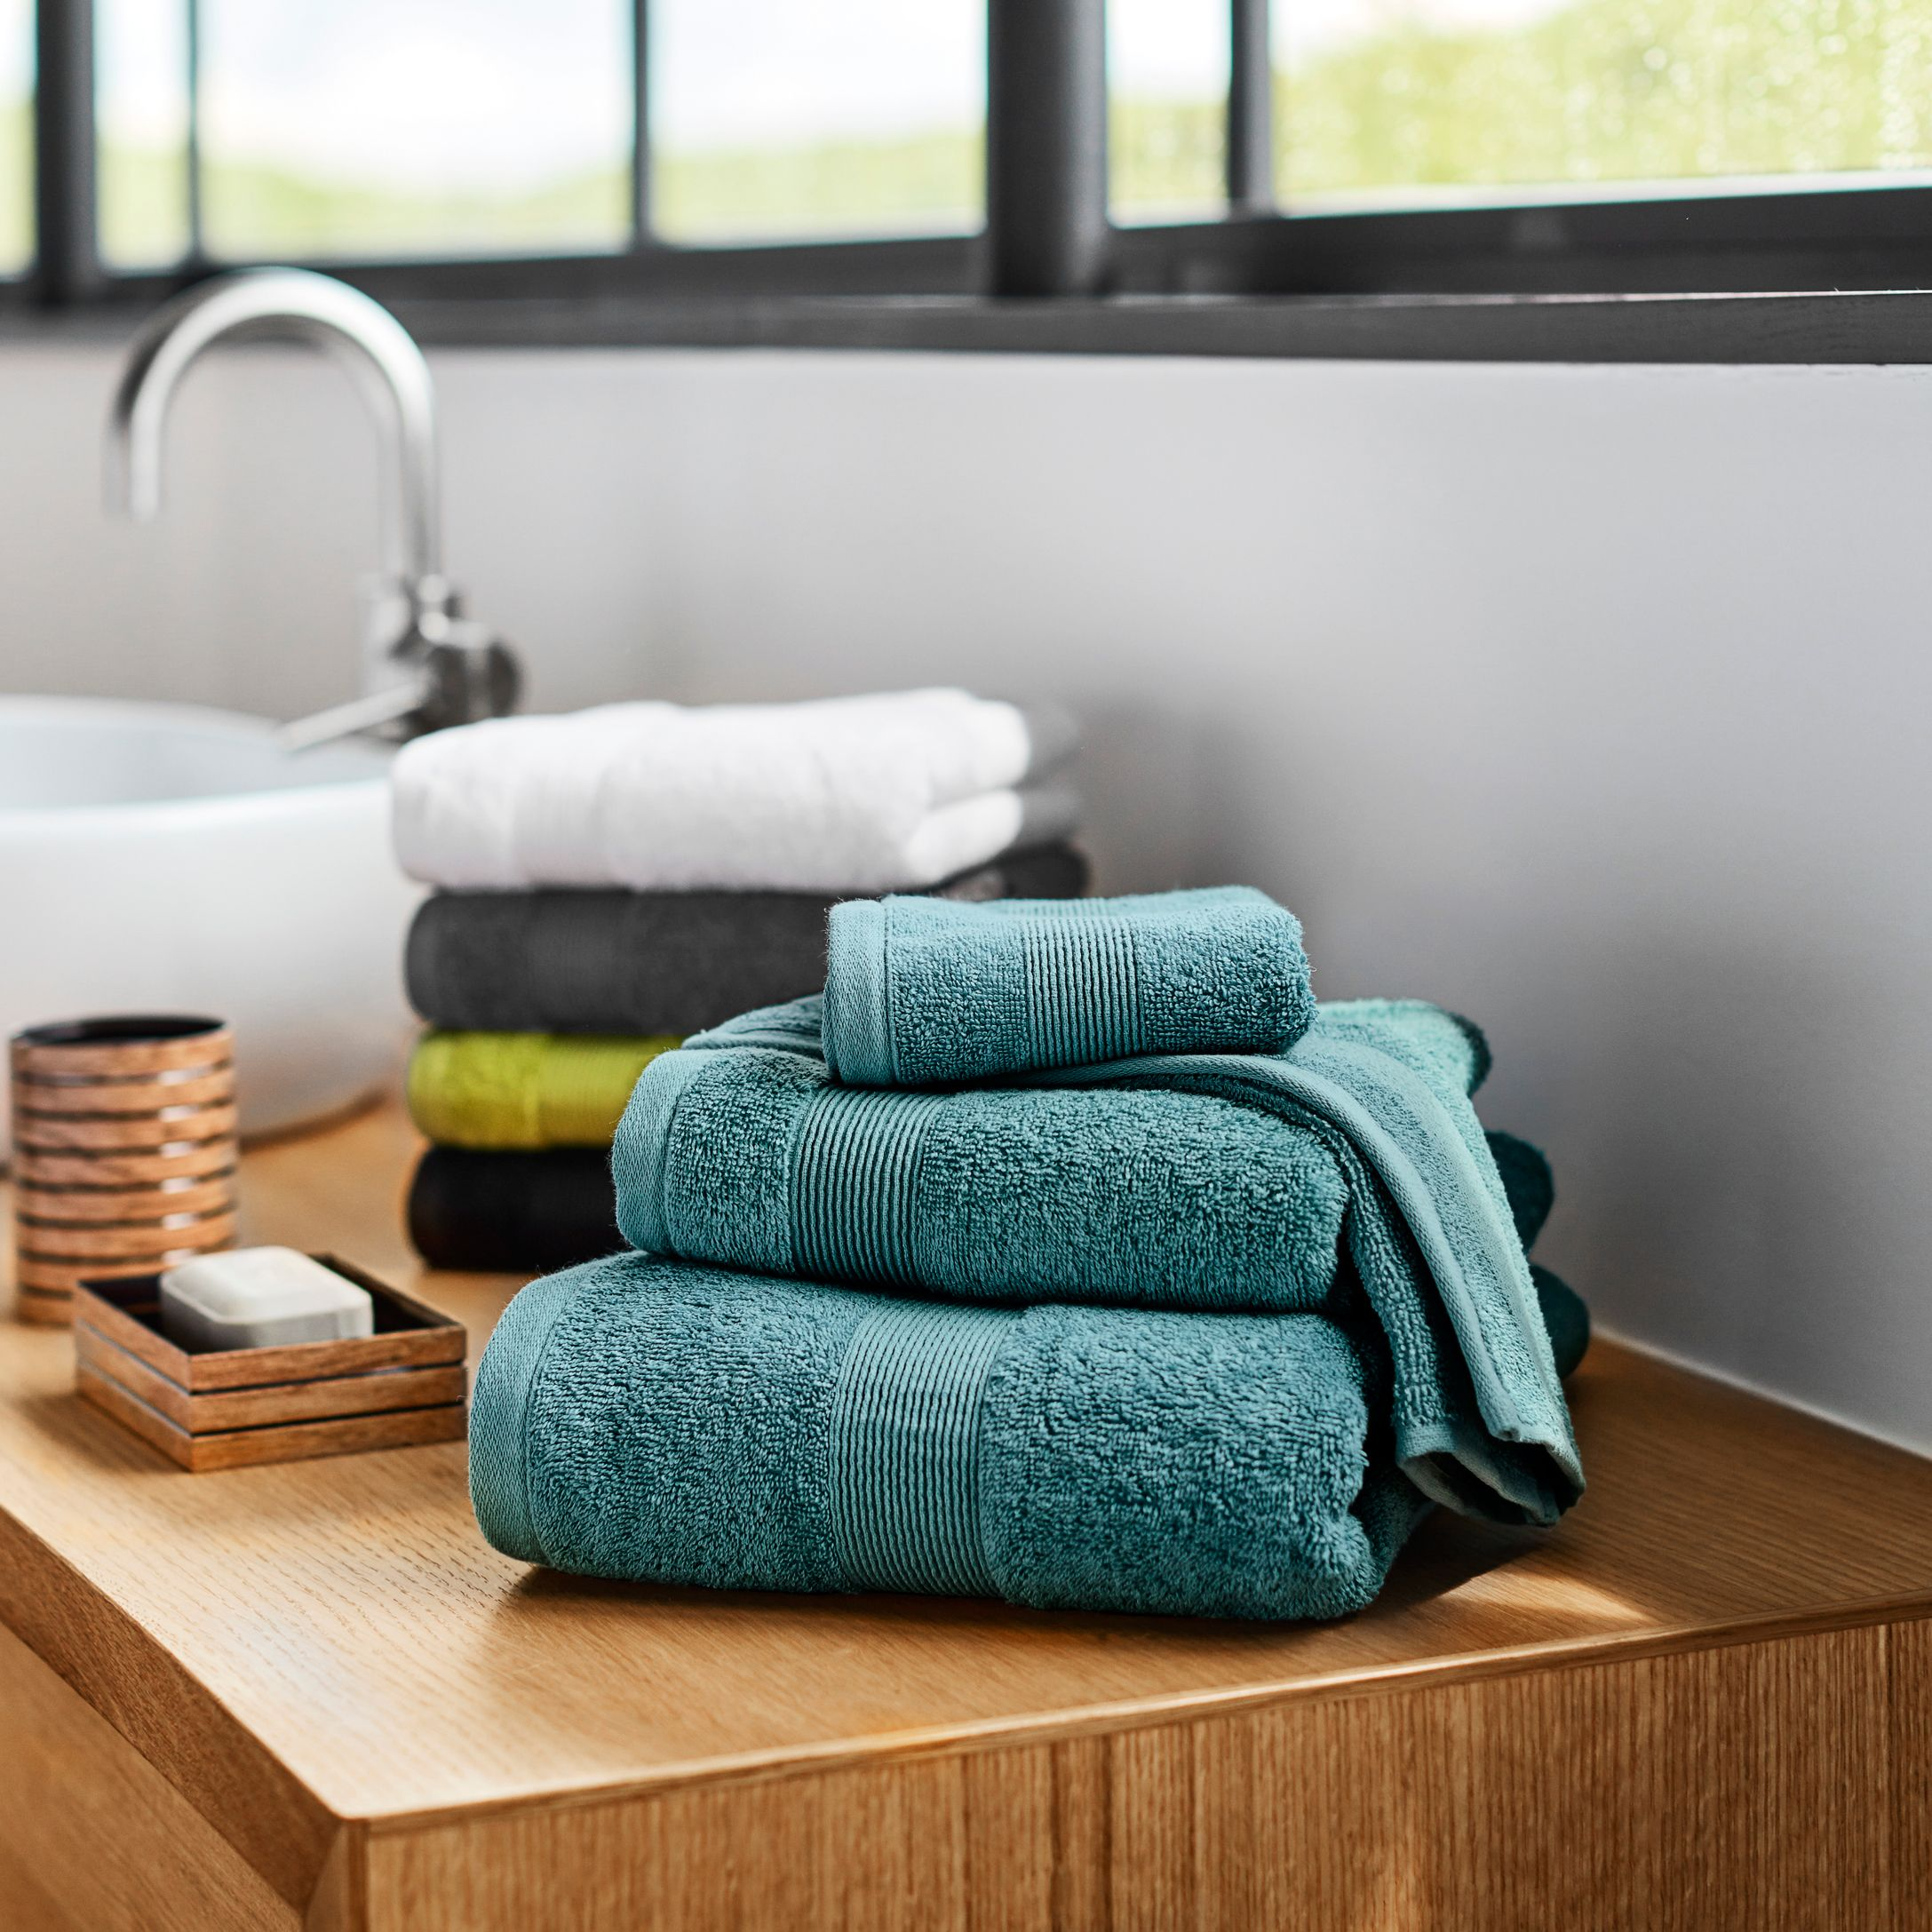 Braided Border Turkish Cotton Towels Turkish Cotton Towels